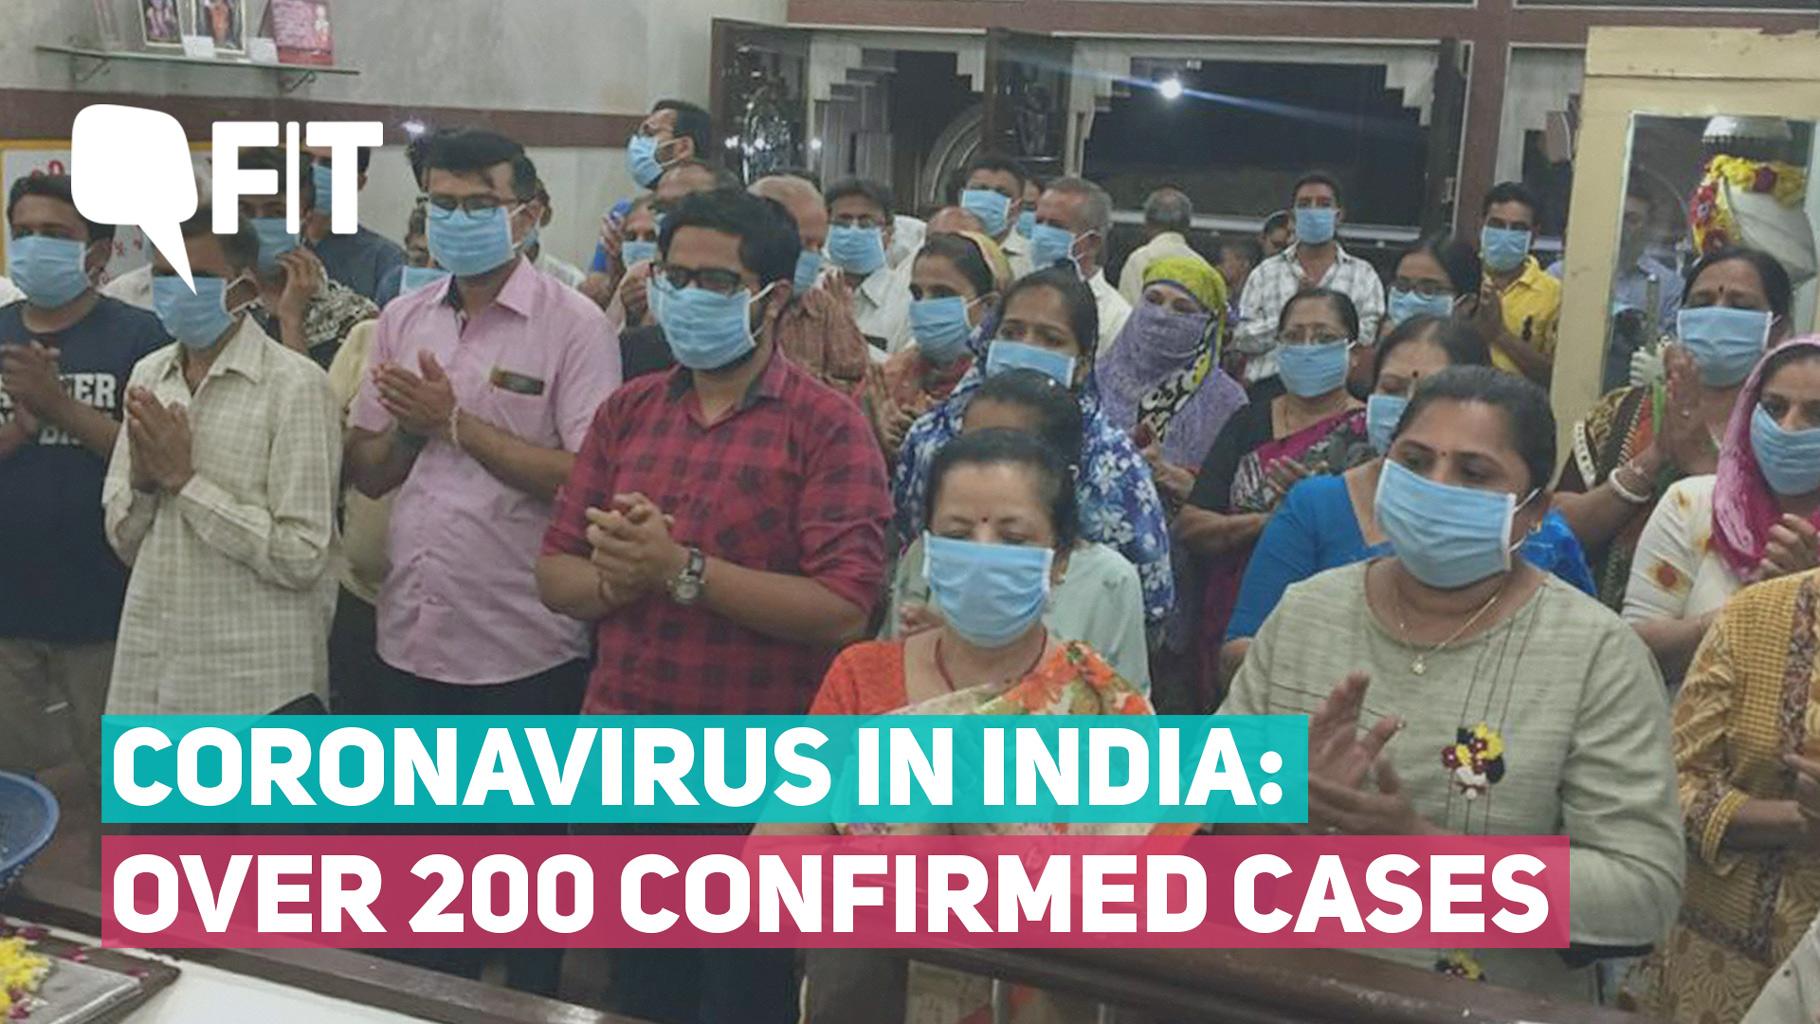 Coronavirus Cases In India Cross 200, Govt Launches Corona Helpdesk